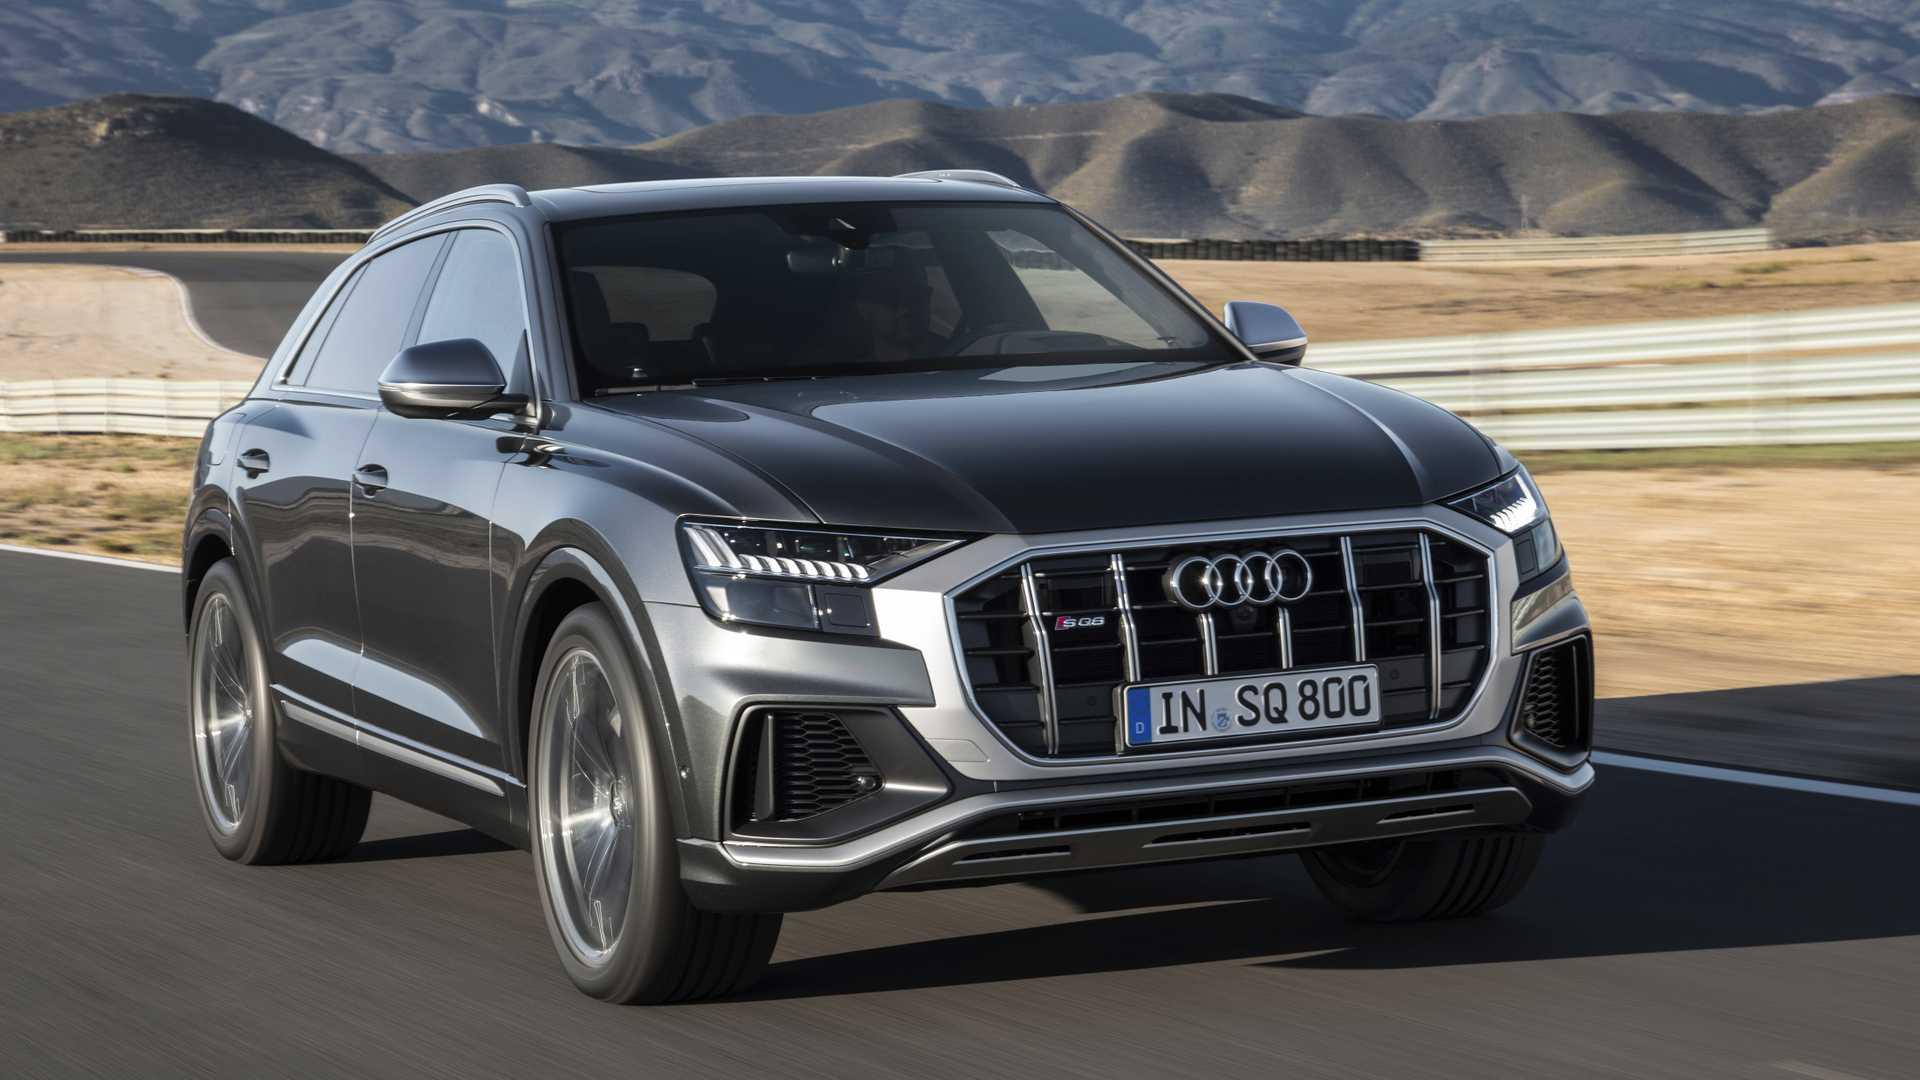 Kelebihan Kekurangan Audi Sq8 2019 Review